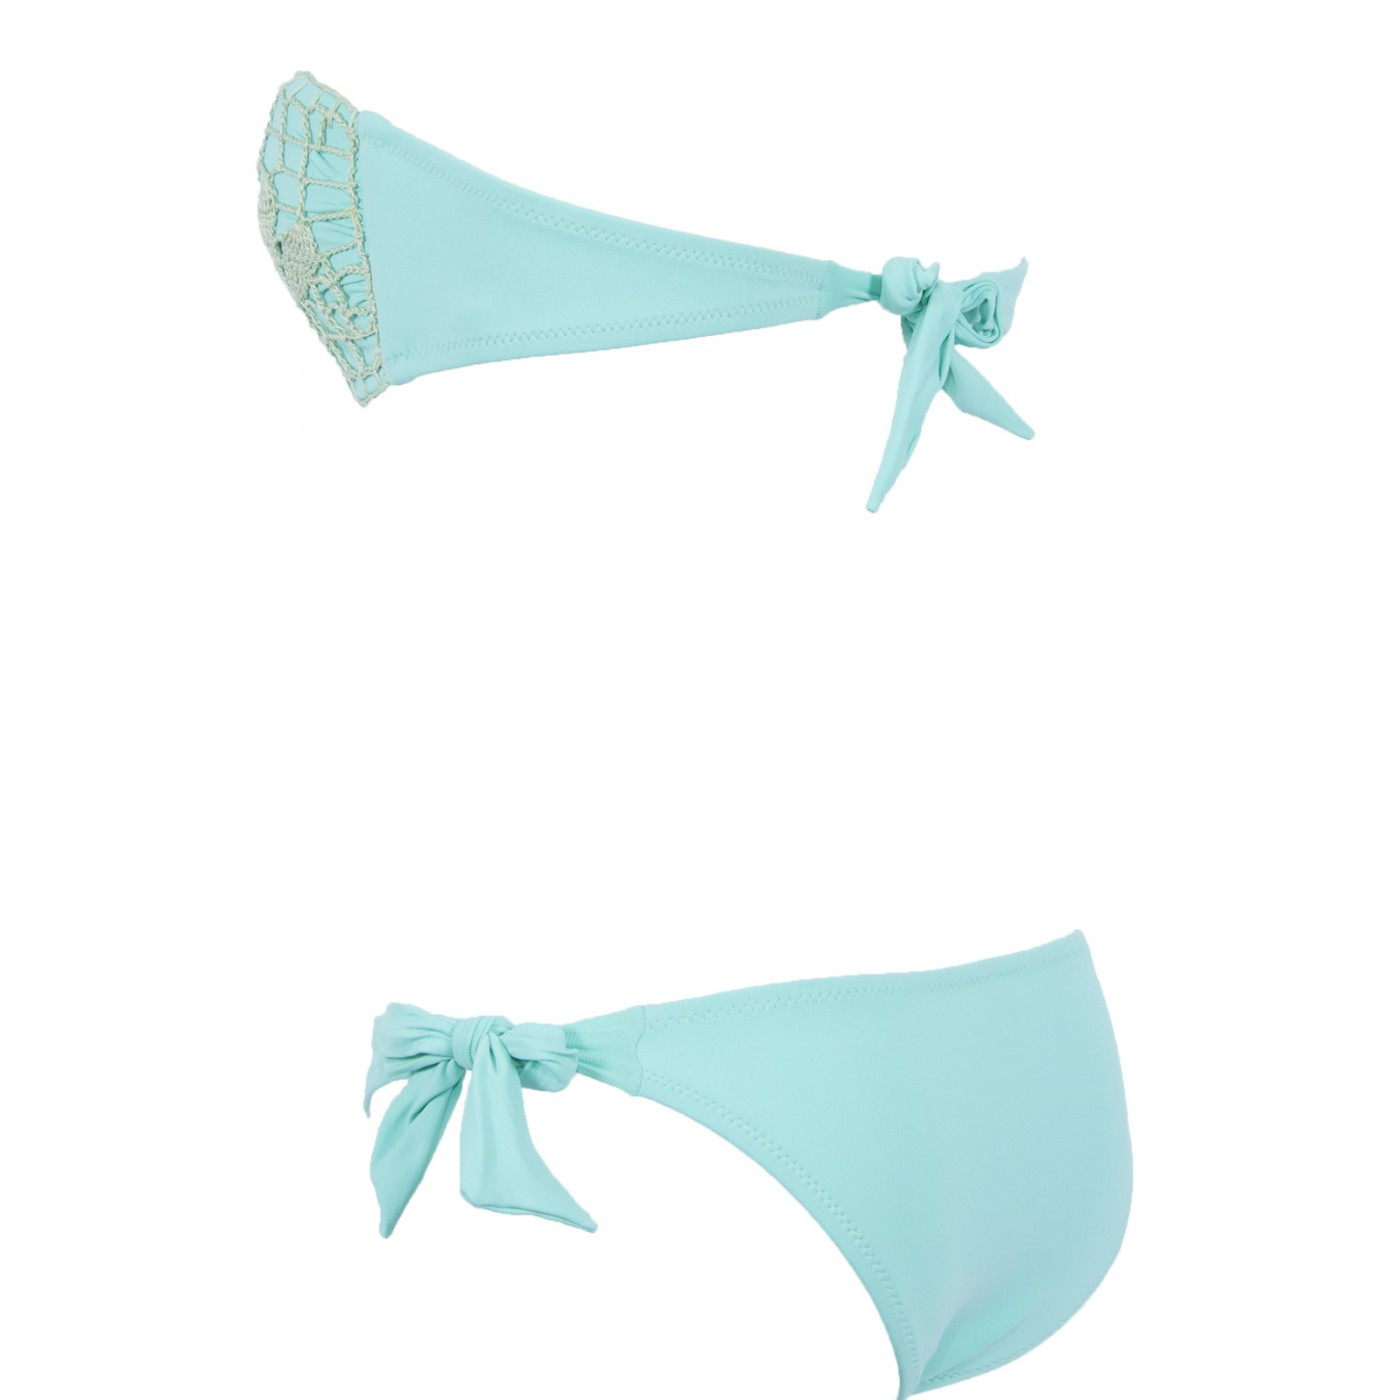 Solymar Maillot Bain 2 Bandeau Pièces Beachwear Crochet De Opale KFcTJl31